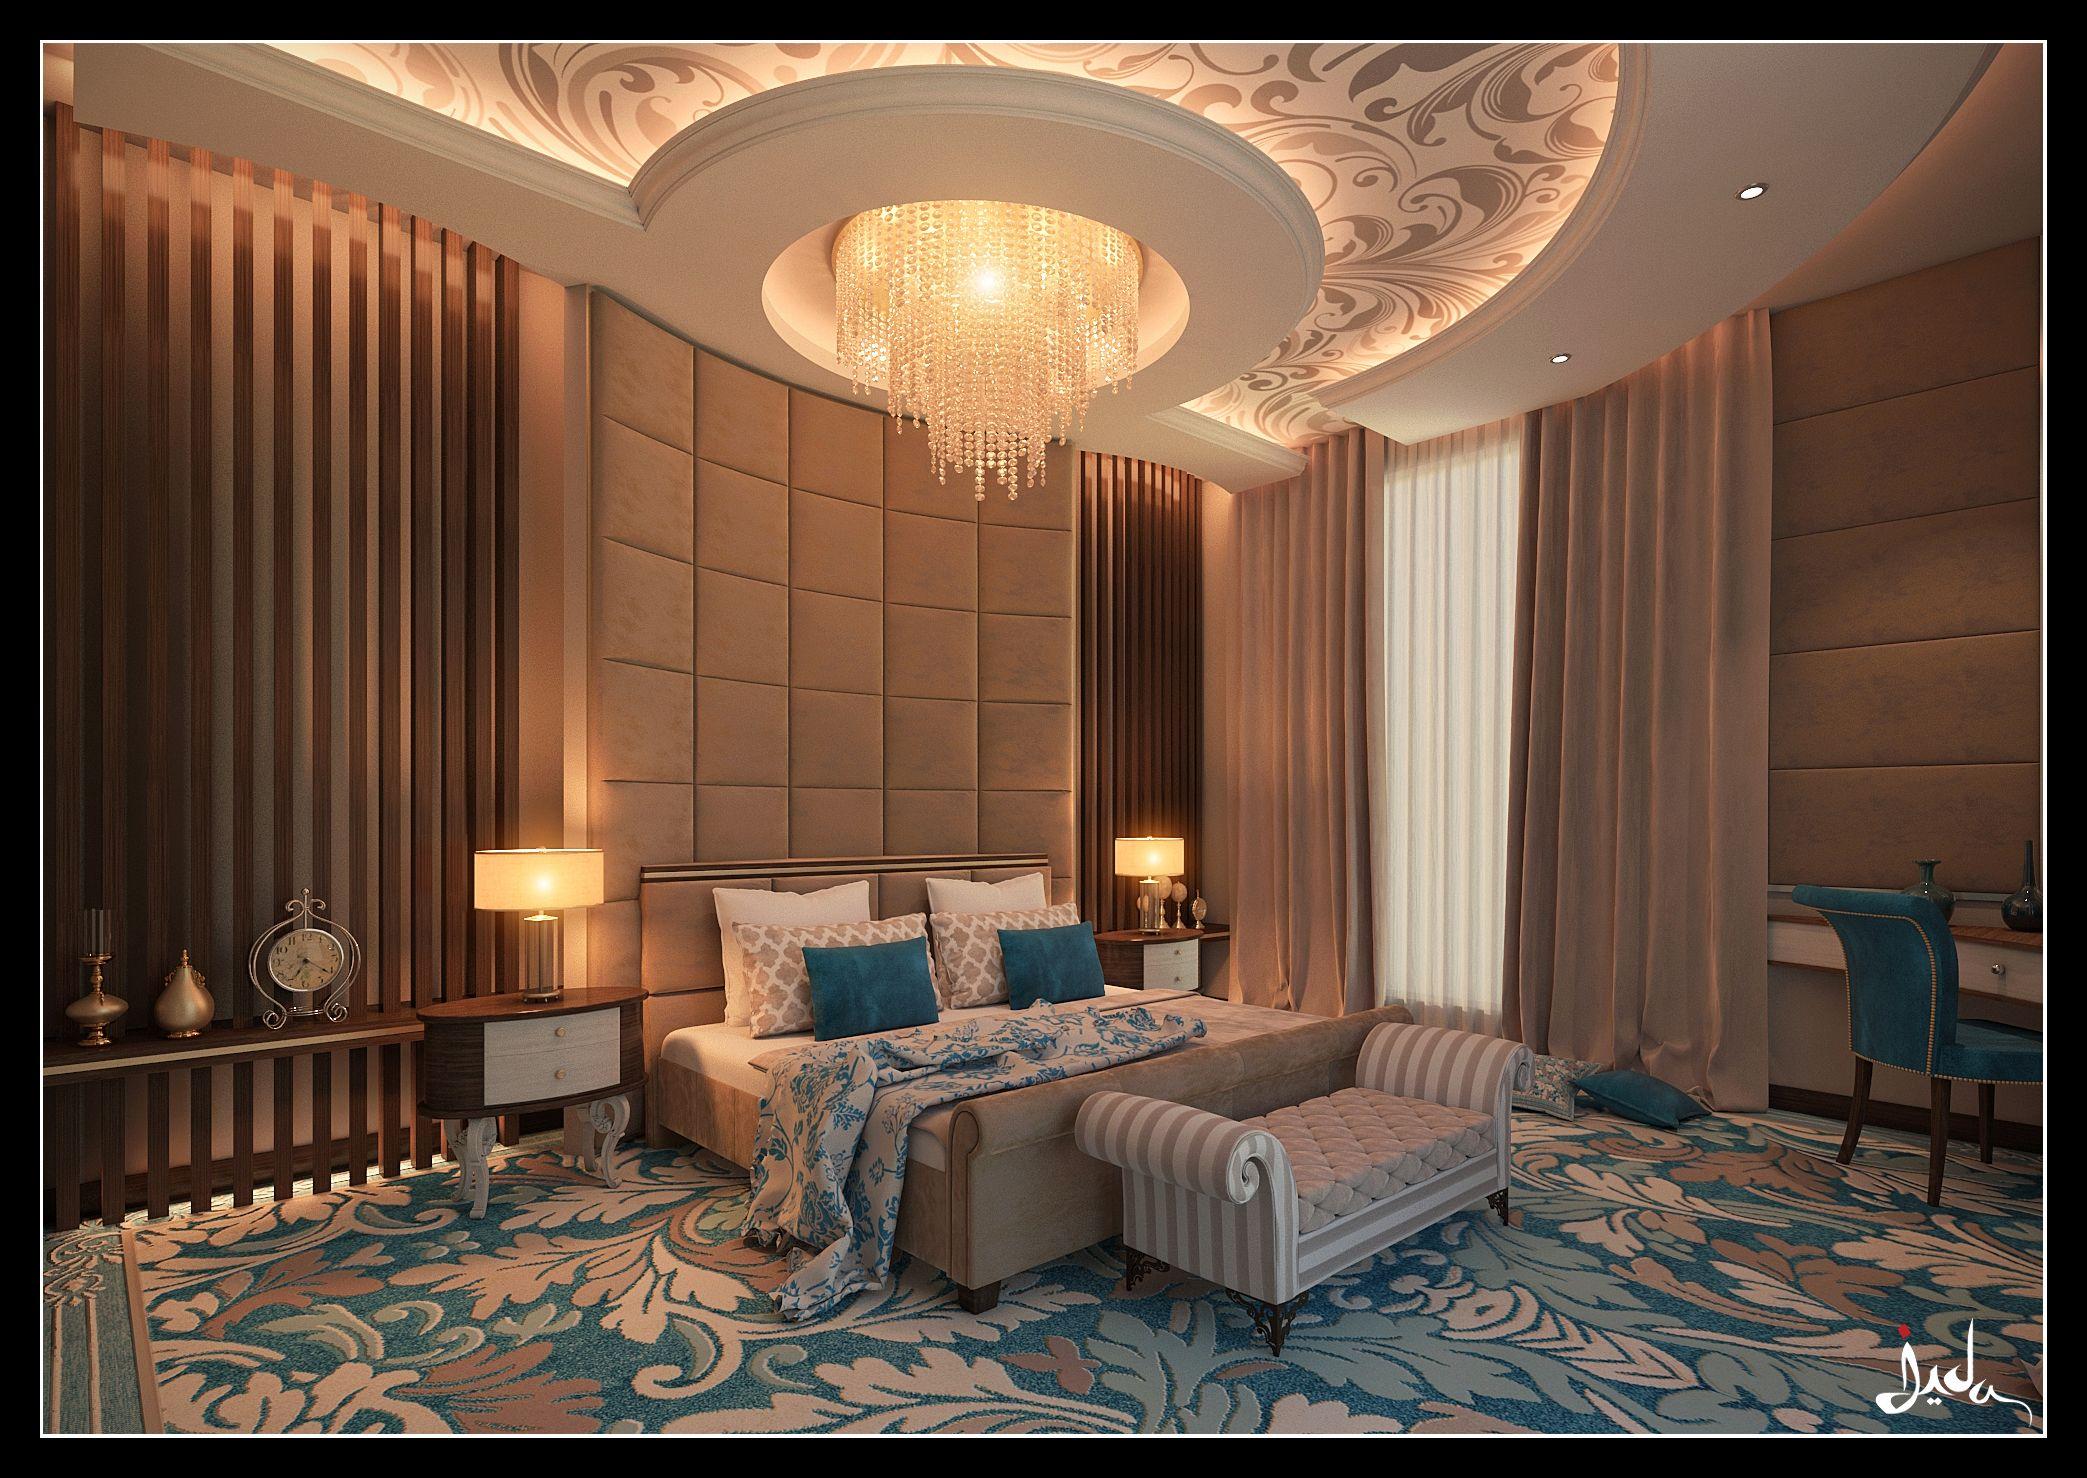 Elegant Luxury Interior Design By Jida For More Designs Contact Us On 920006386 تصميم داخلي تصميم معماري Interior Design Design Architect Design